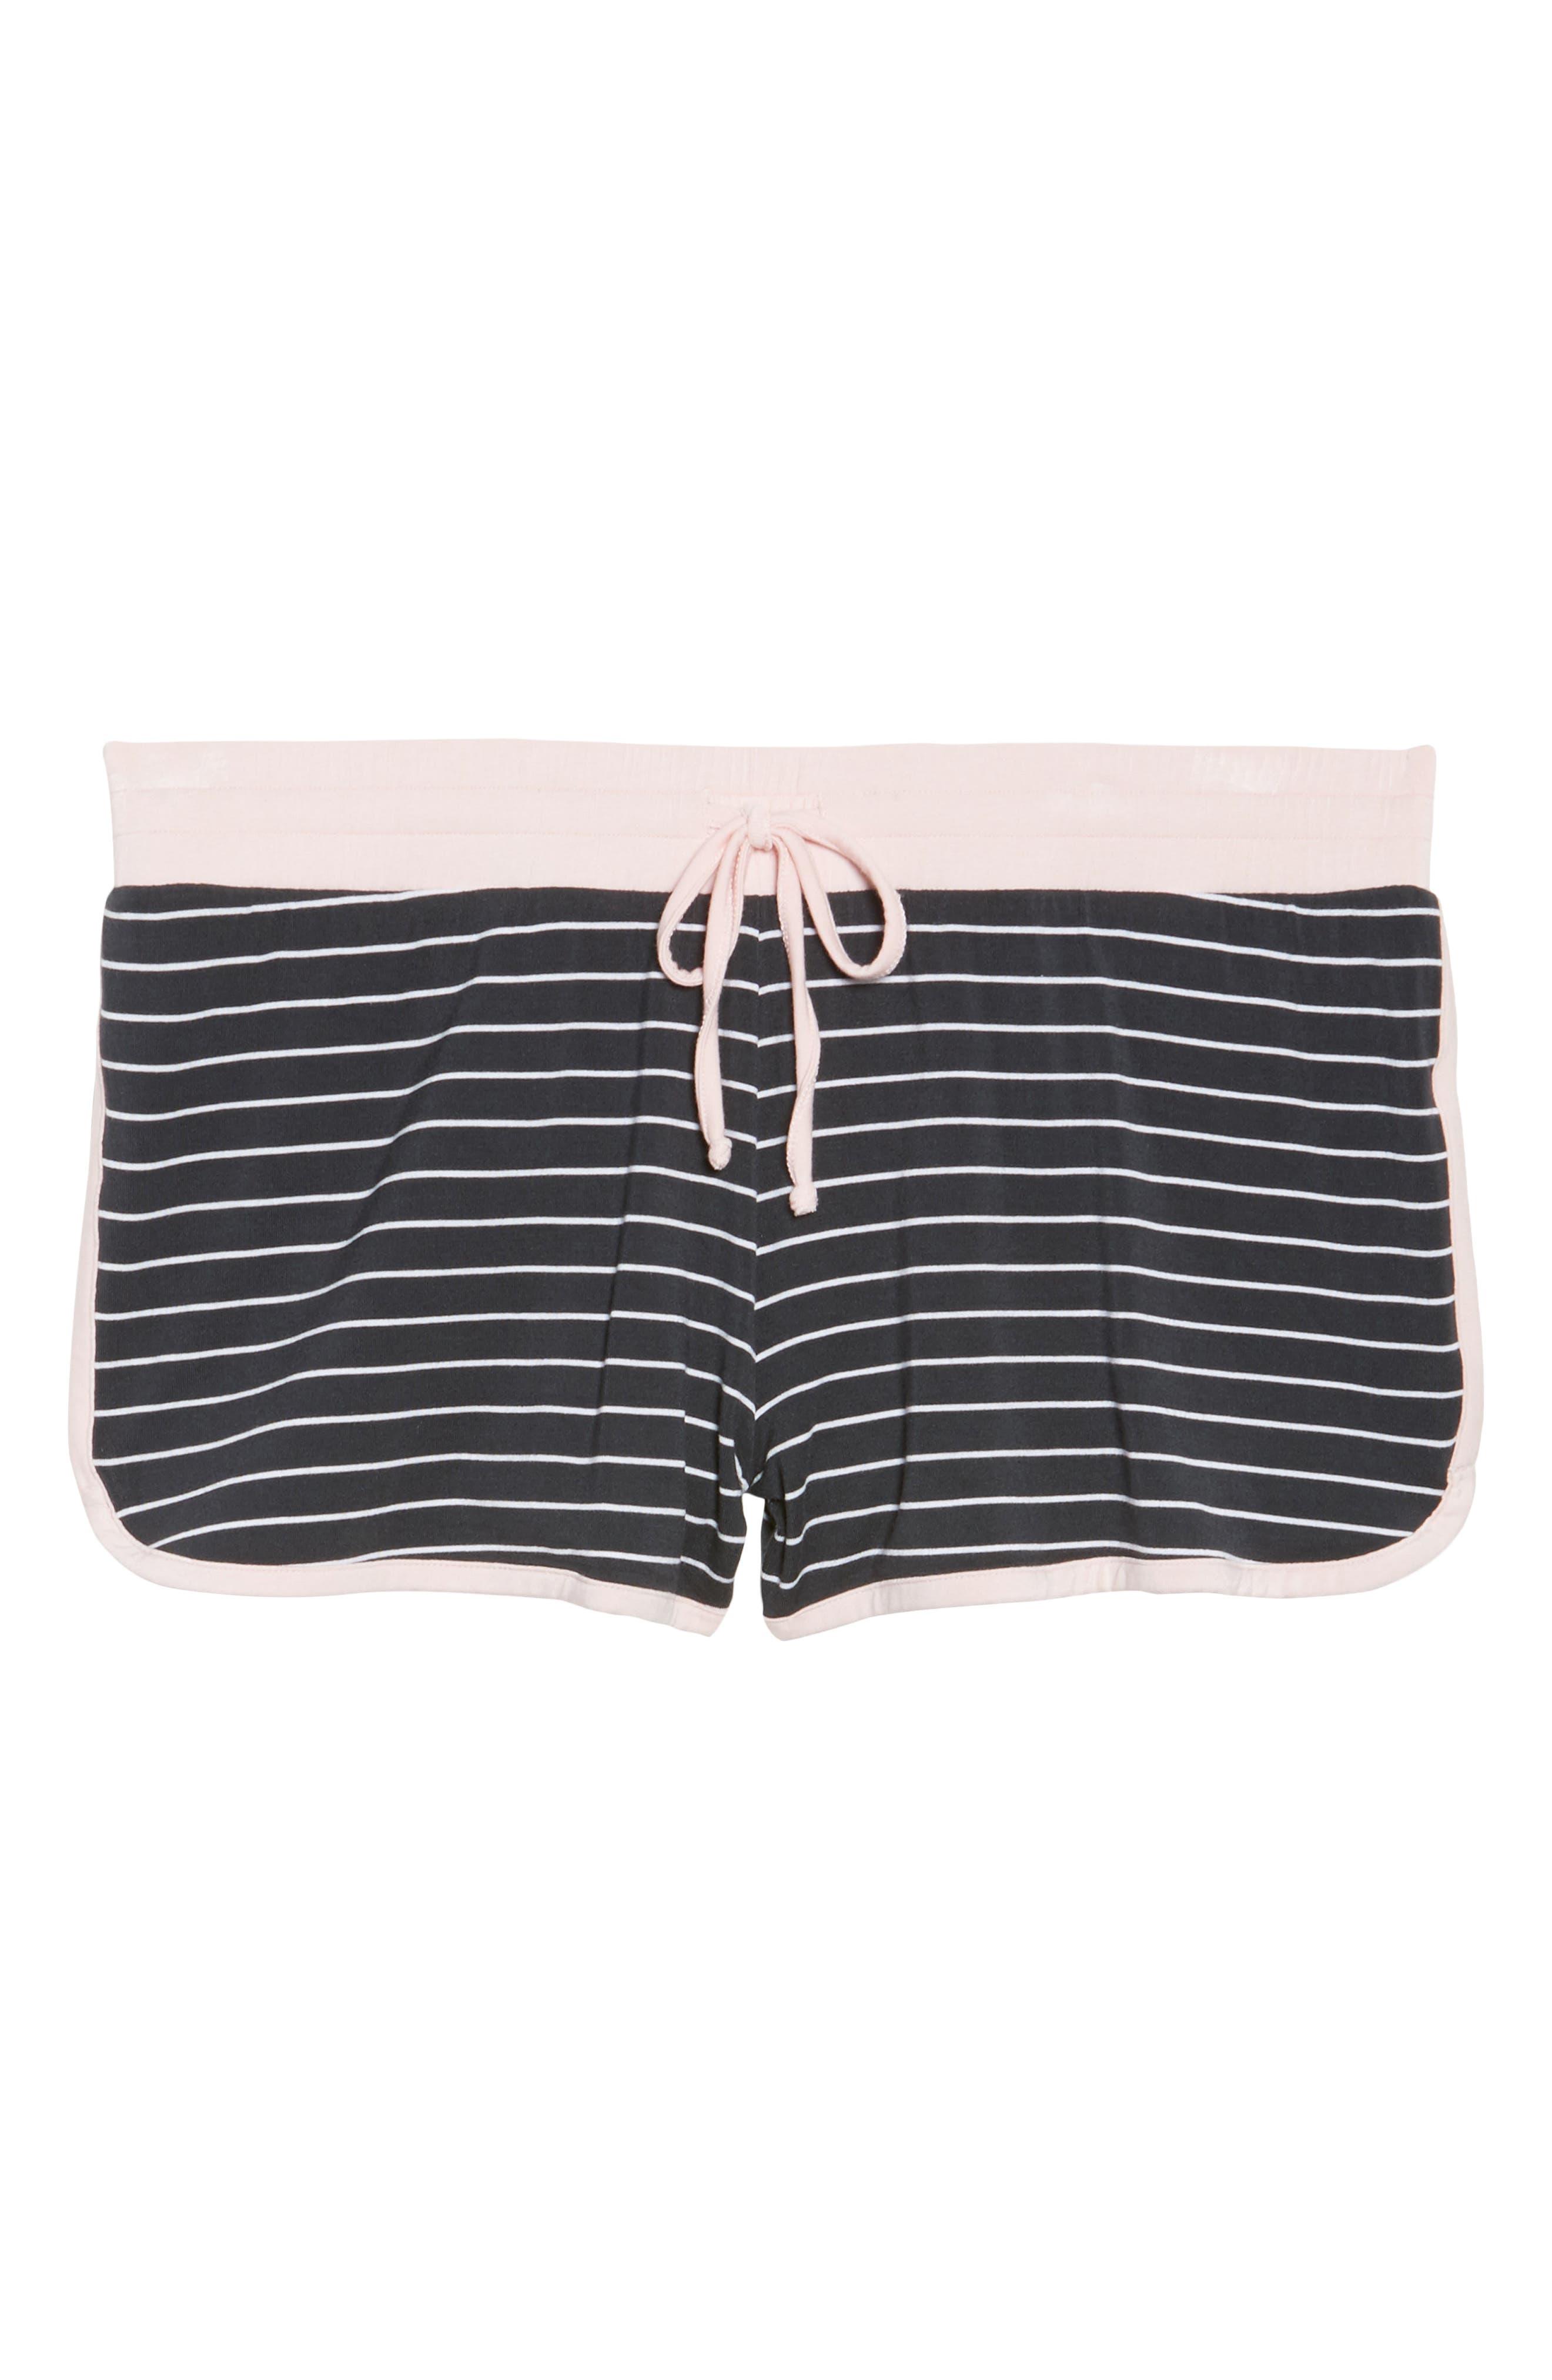 Stripe Jersey Shorts,                             Alternate thumbnail 7, color,                             Smoke